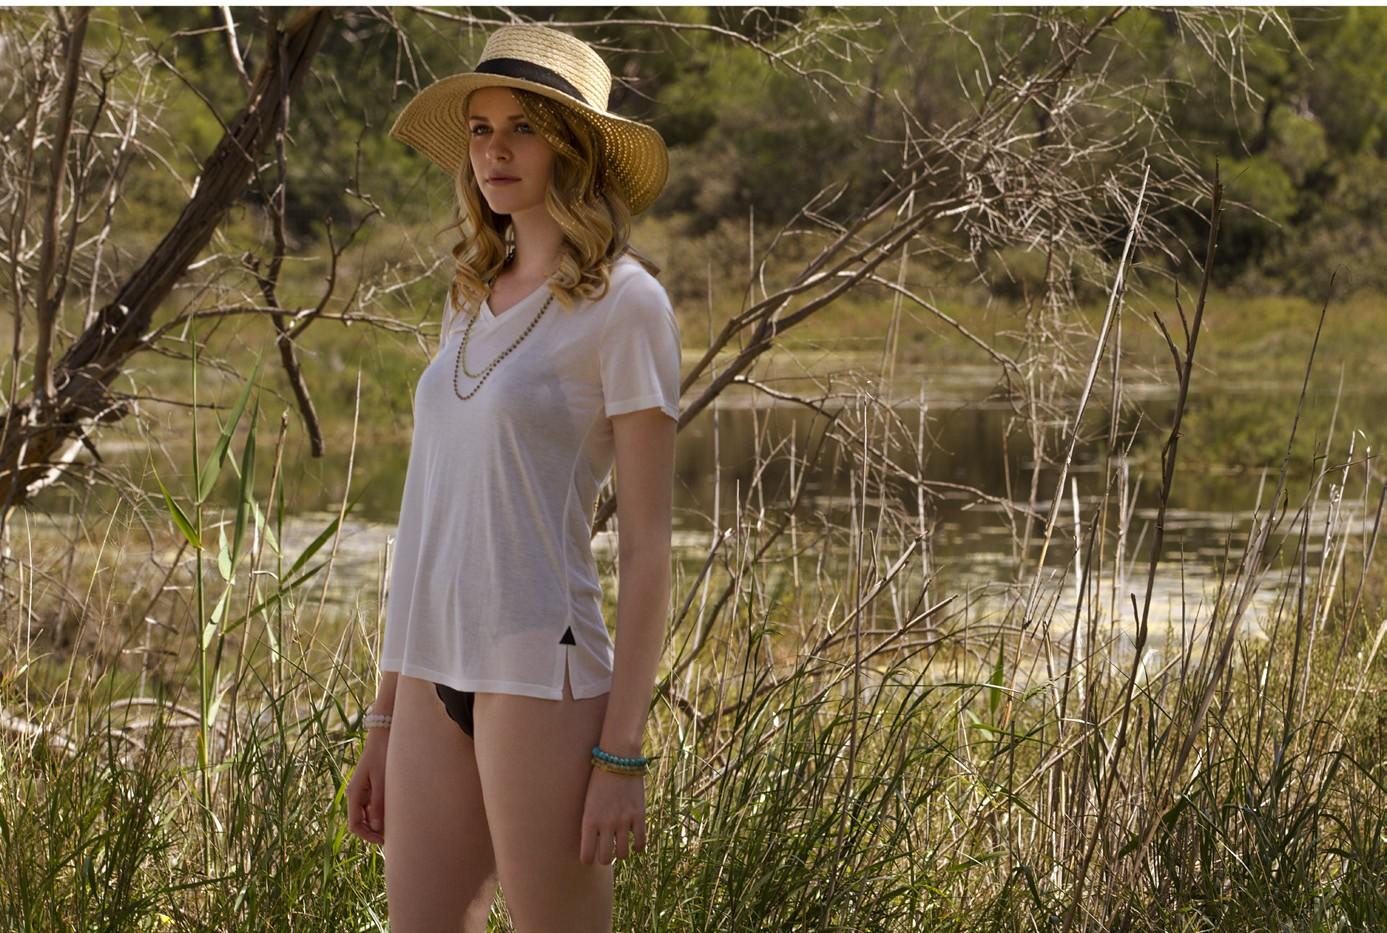 Sarina Picone: Το casual chic brand που αγαπά τη θηλυκότητα και τη φύση